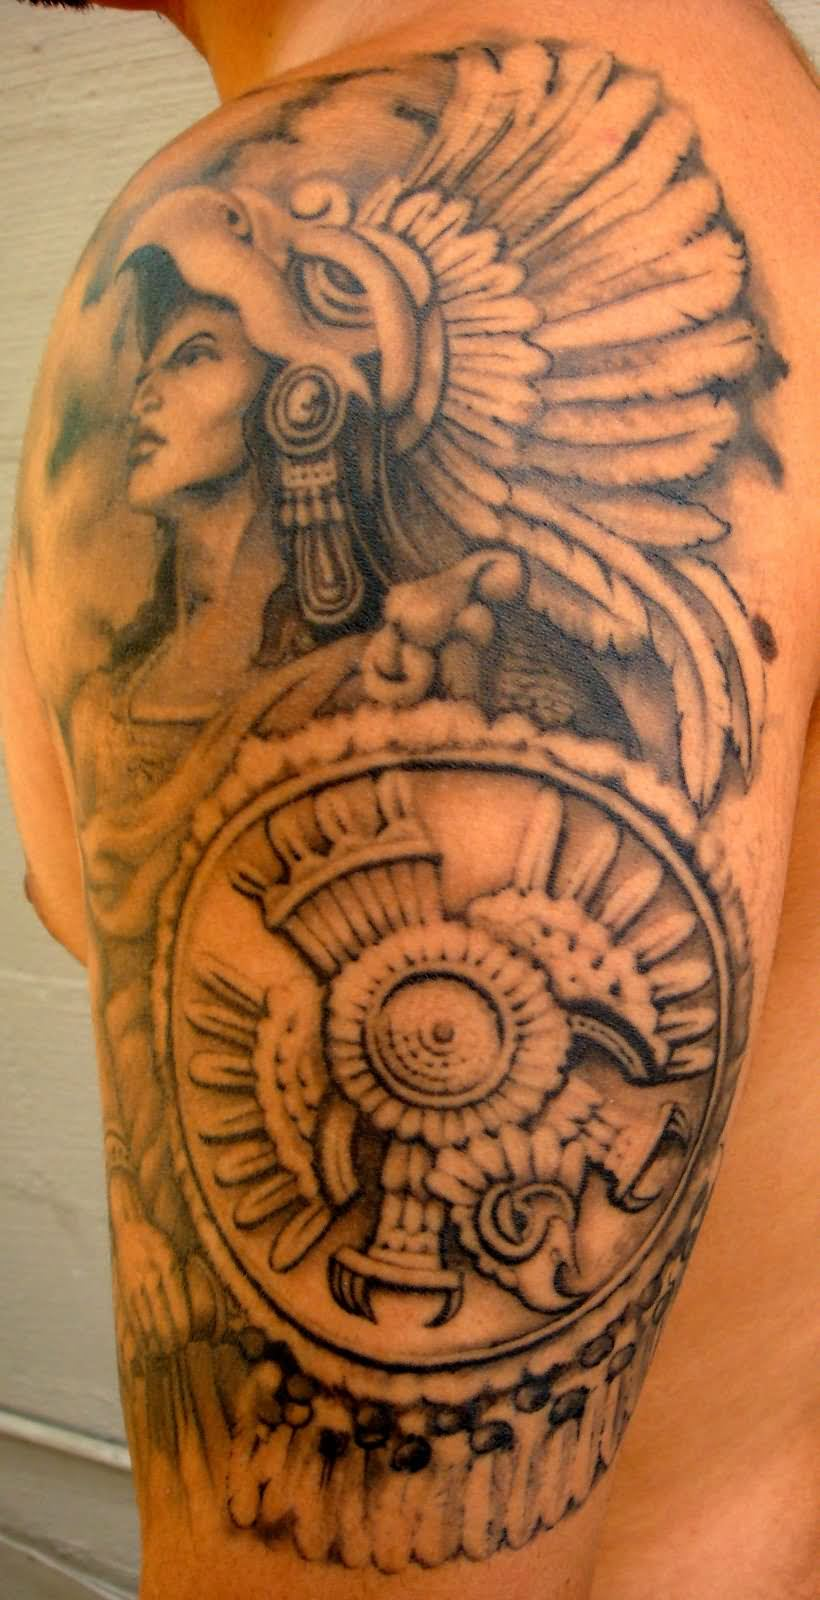 Aztec Style Tattoos